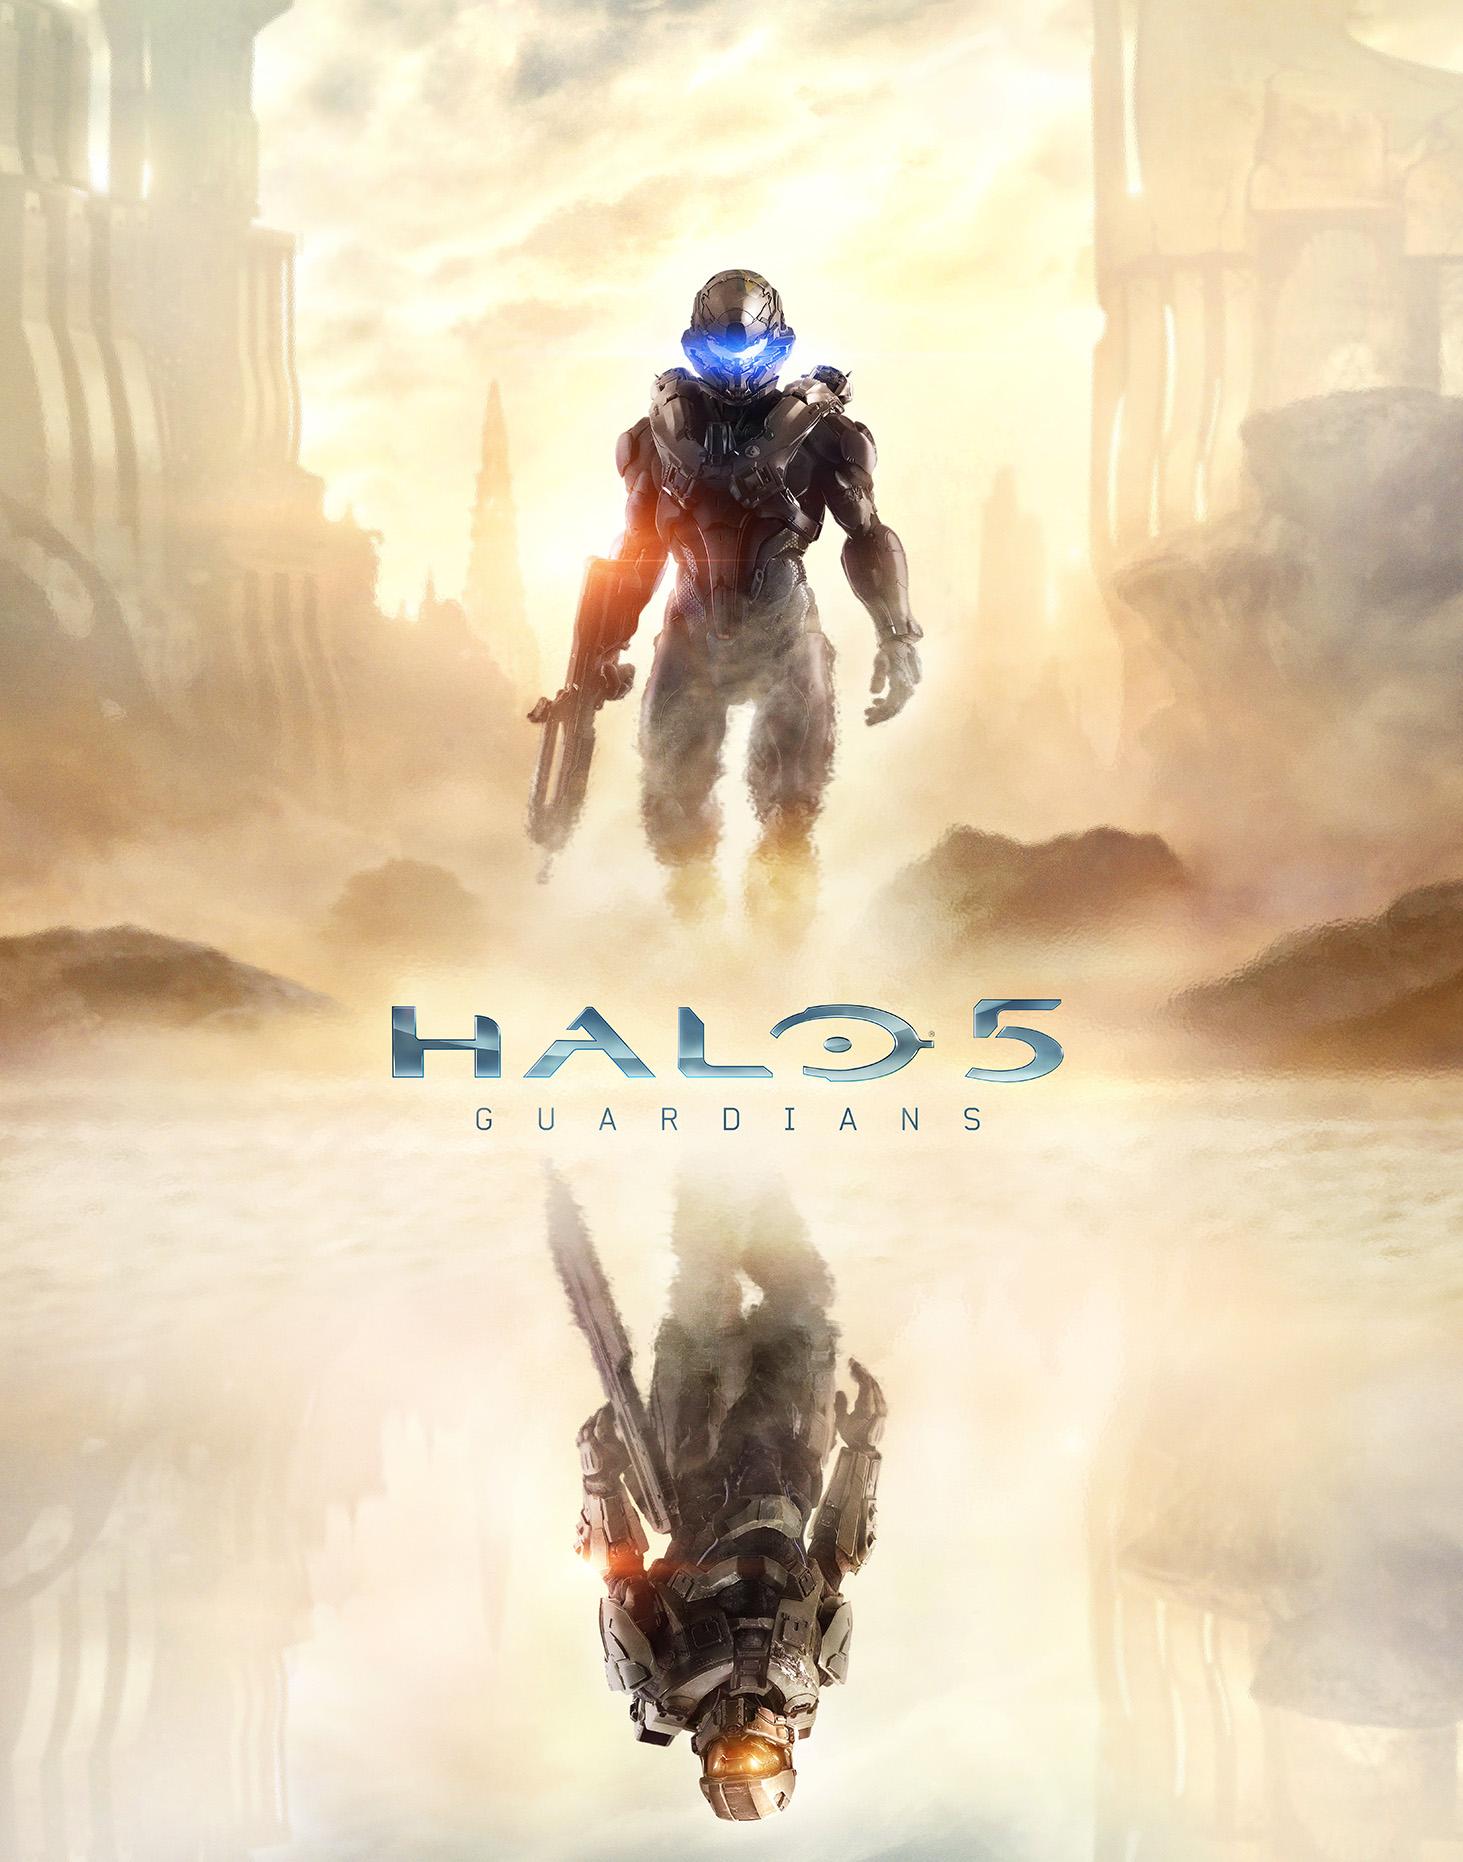 Halo-5-Guardians_2014_05-16-14_002